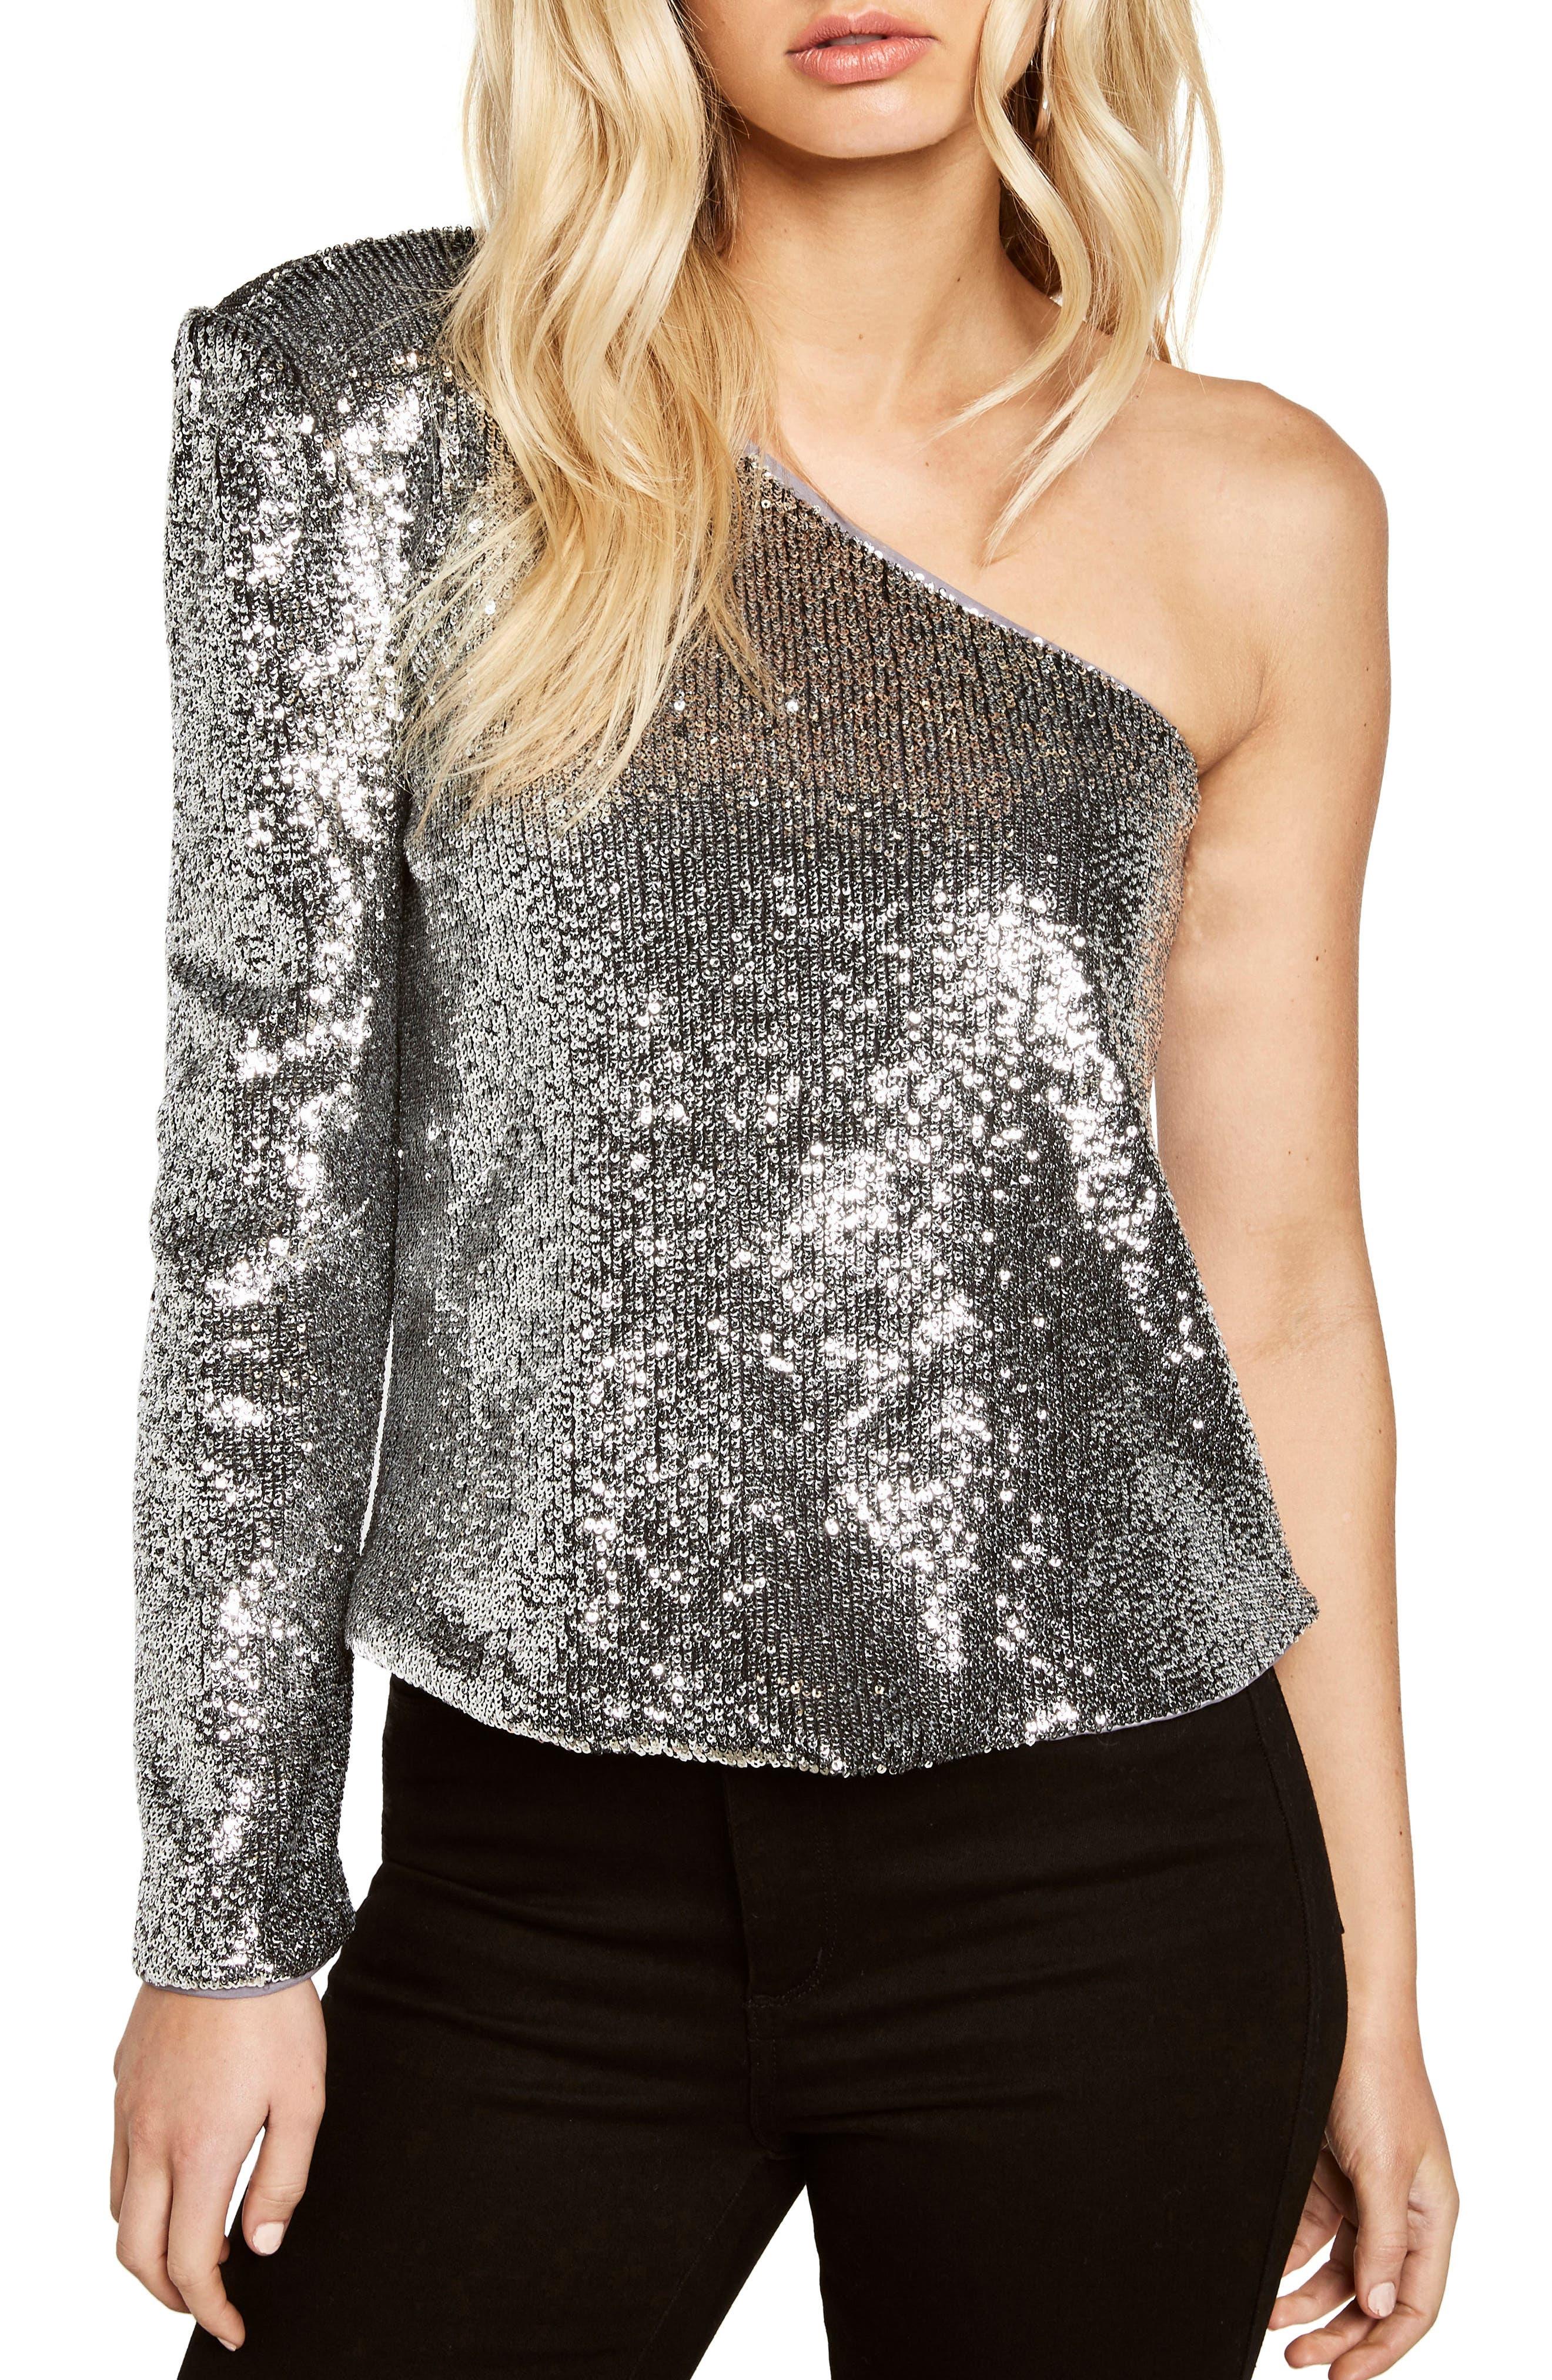 Main Image - Bardot Sequin One-Shoulder Top